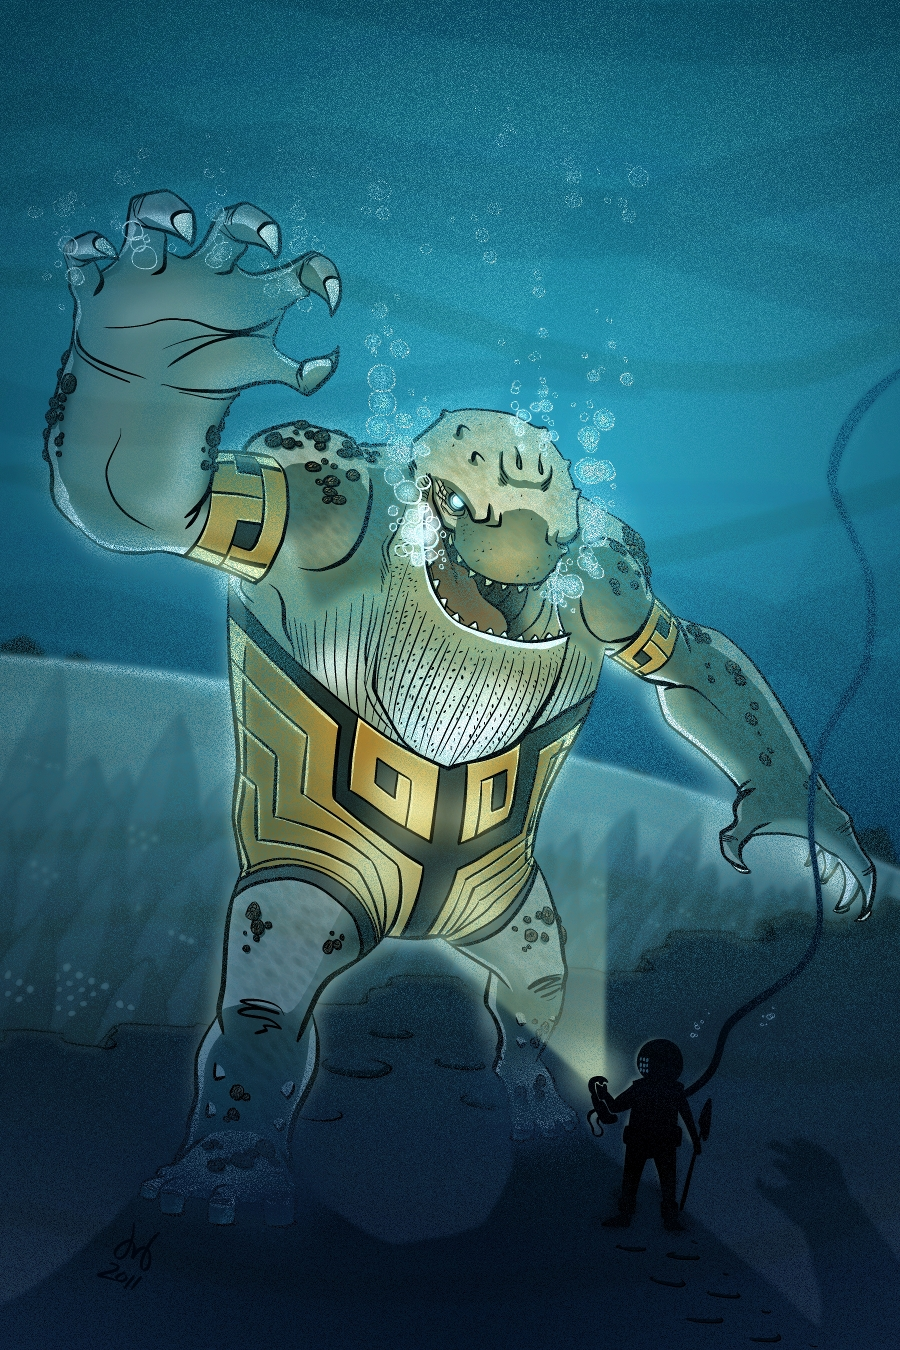 Cetacius, Guardian of Atlantis by DBed